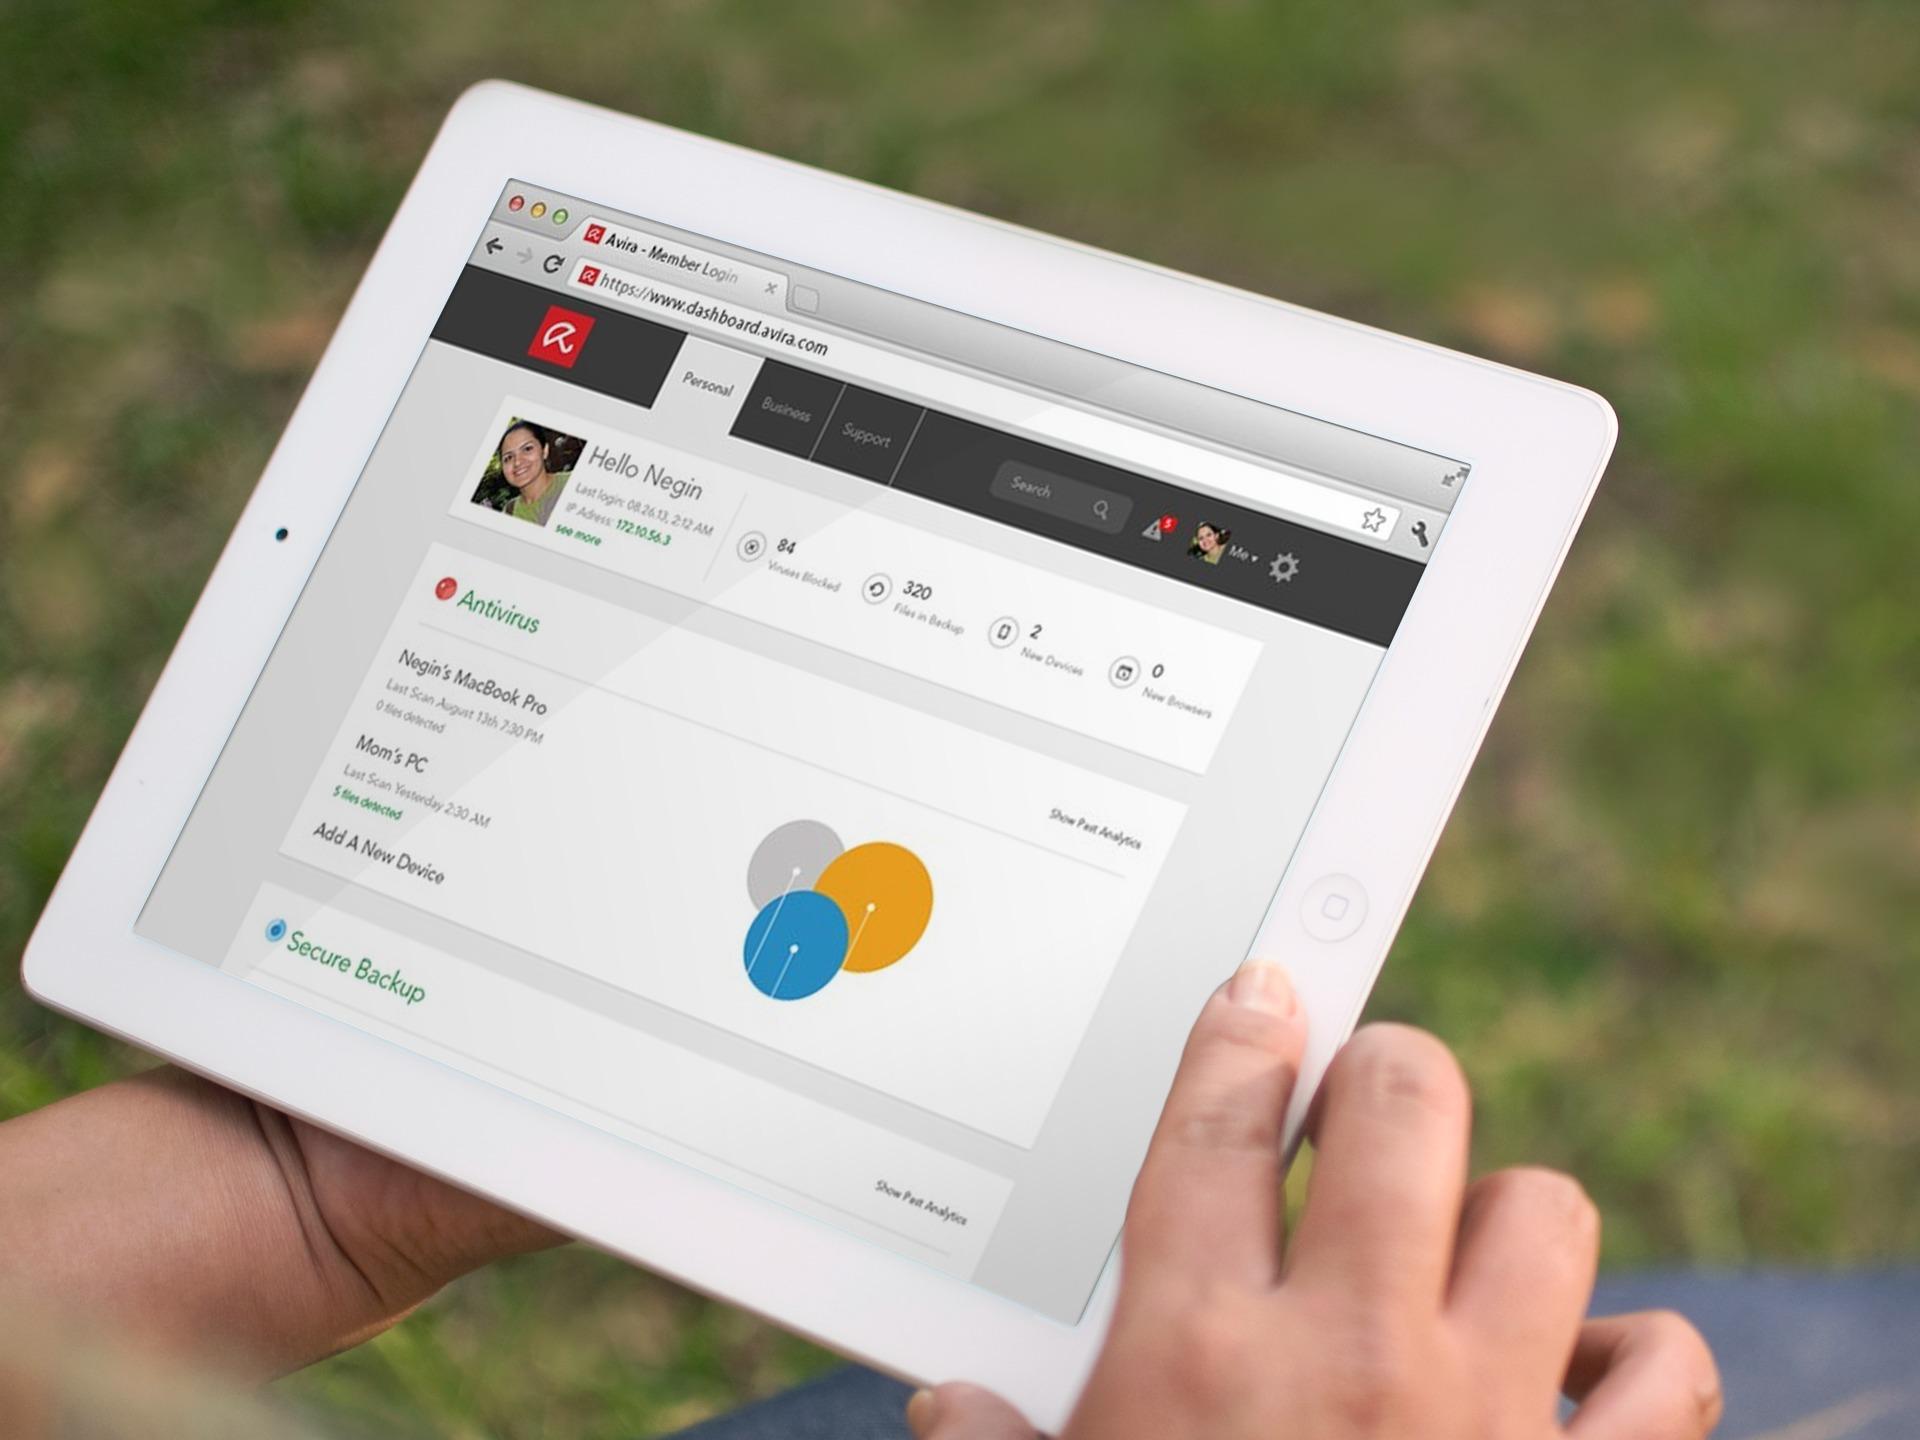 Avira: Users Dashboard (Web/UI/UX Design)